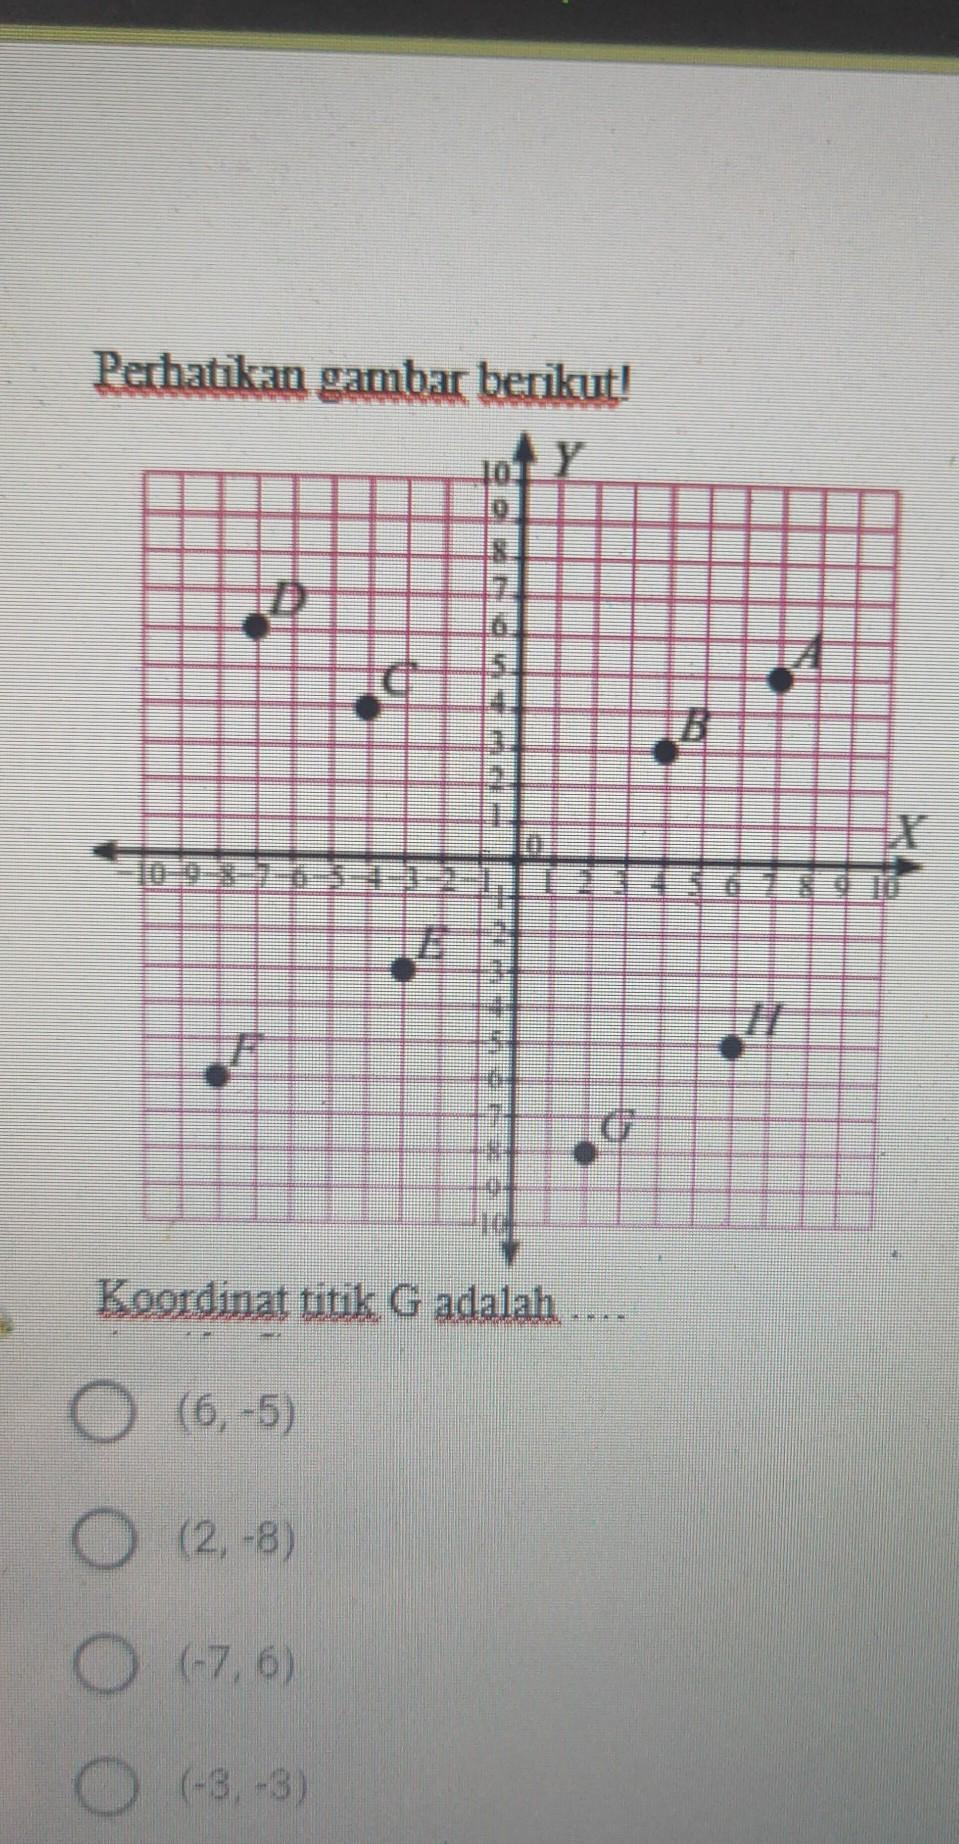 Rumus Titik Koordinat : rumus, titik, koordinat, Koordinat, Titik, Adalah, ..a.(6,, B.(2,, -8)c.(-7,, 6)d.(-3,, Brainly.co.id